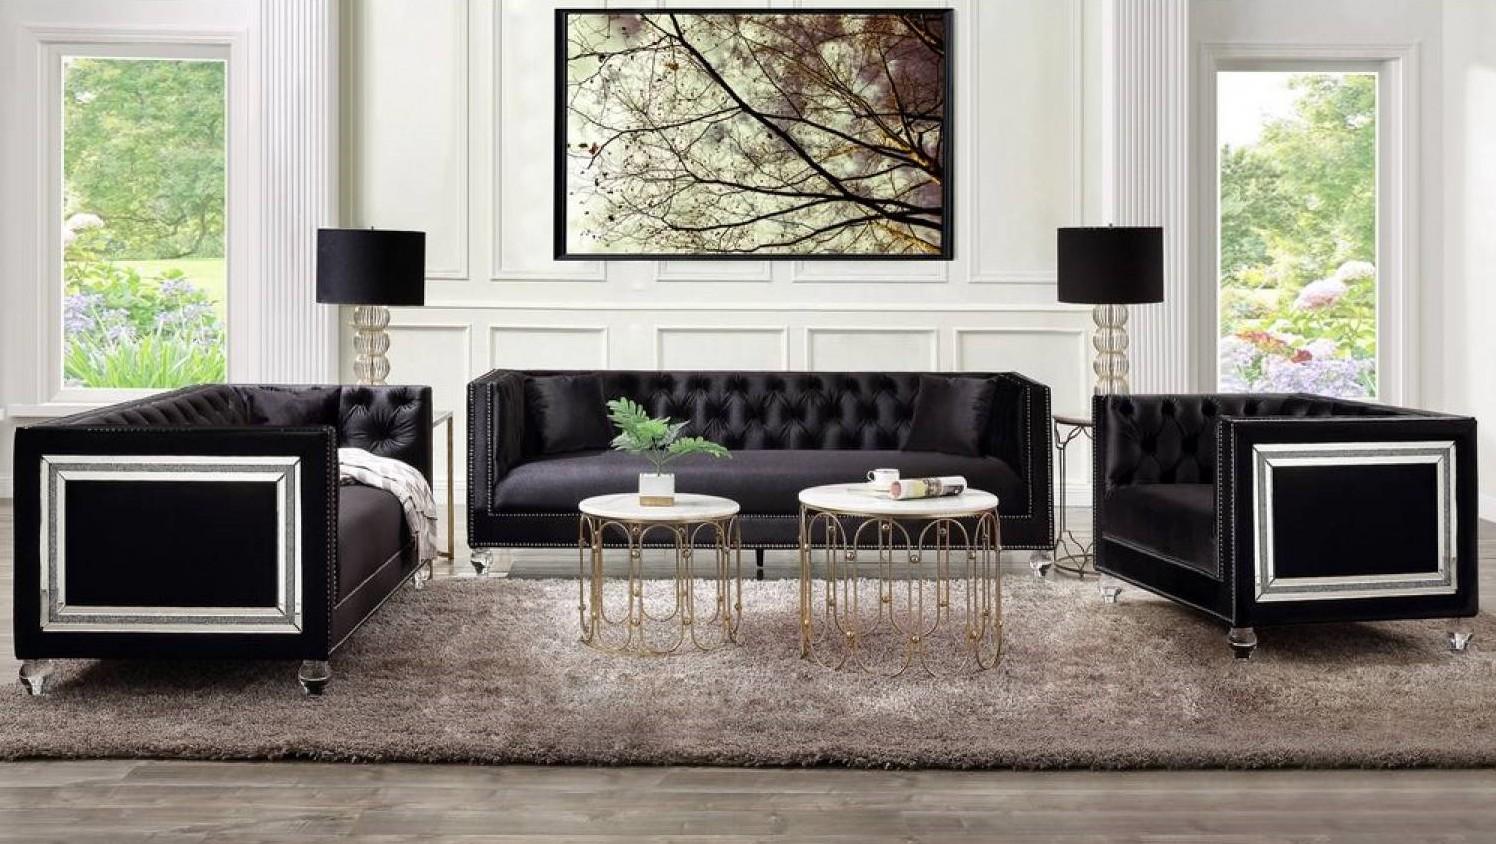 Acme 56995-96 Astoria Grand heibero black tufted velvet fabric and nail head trim sofa and love seat set